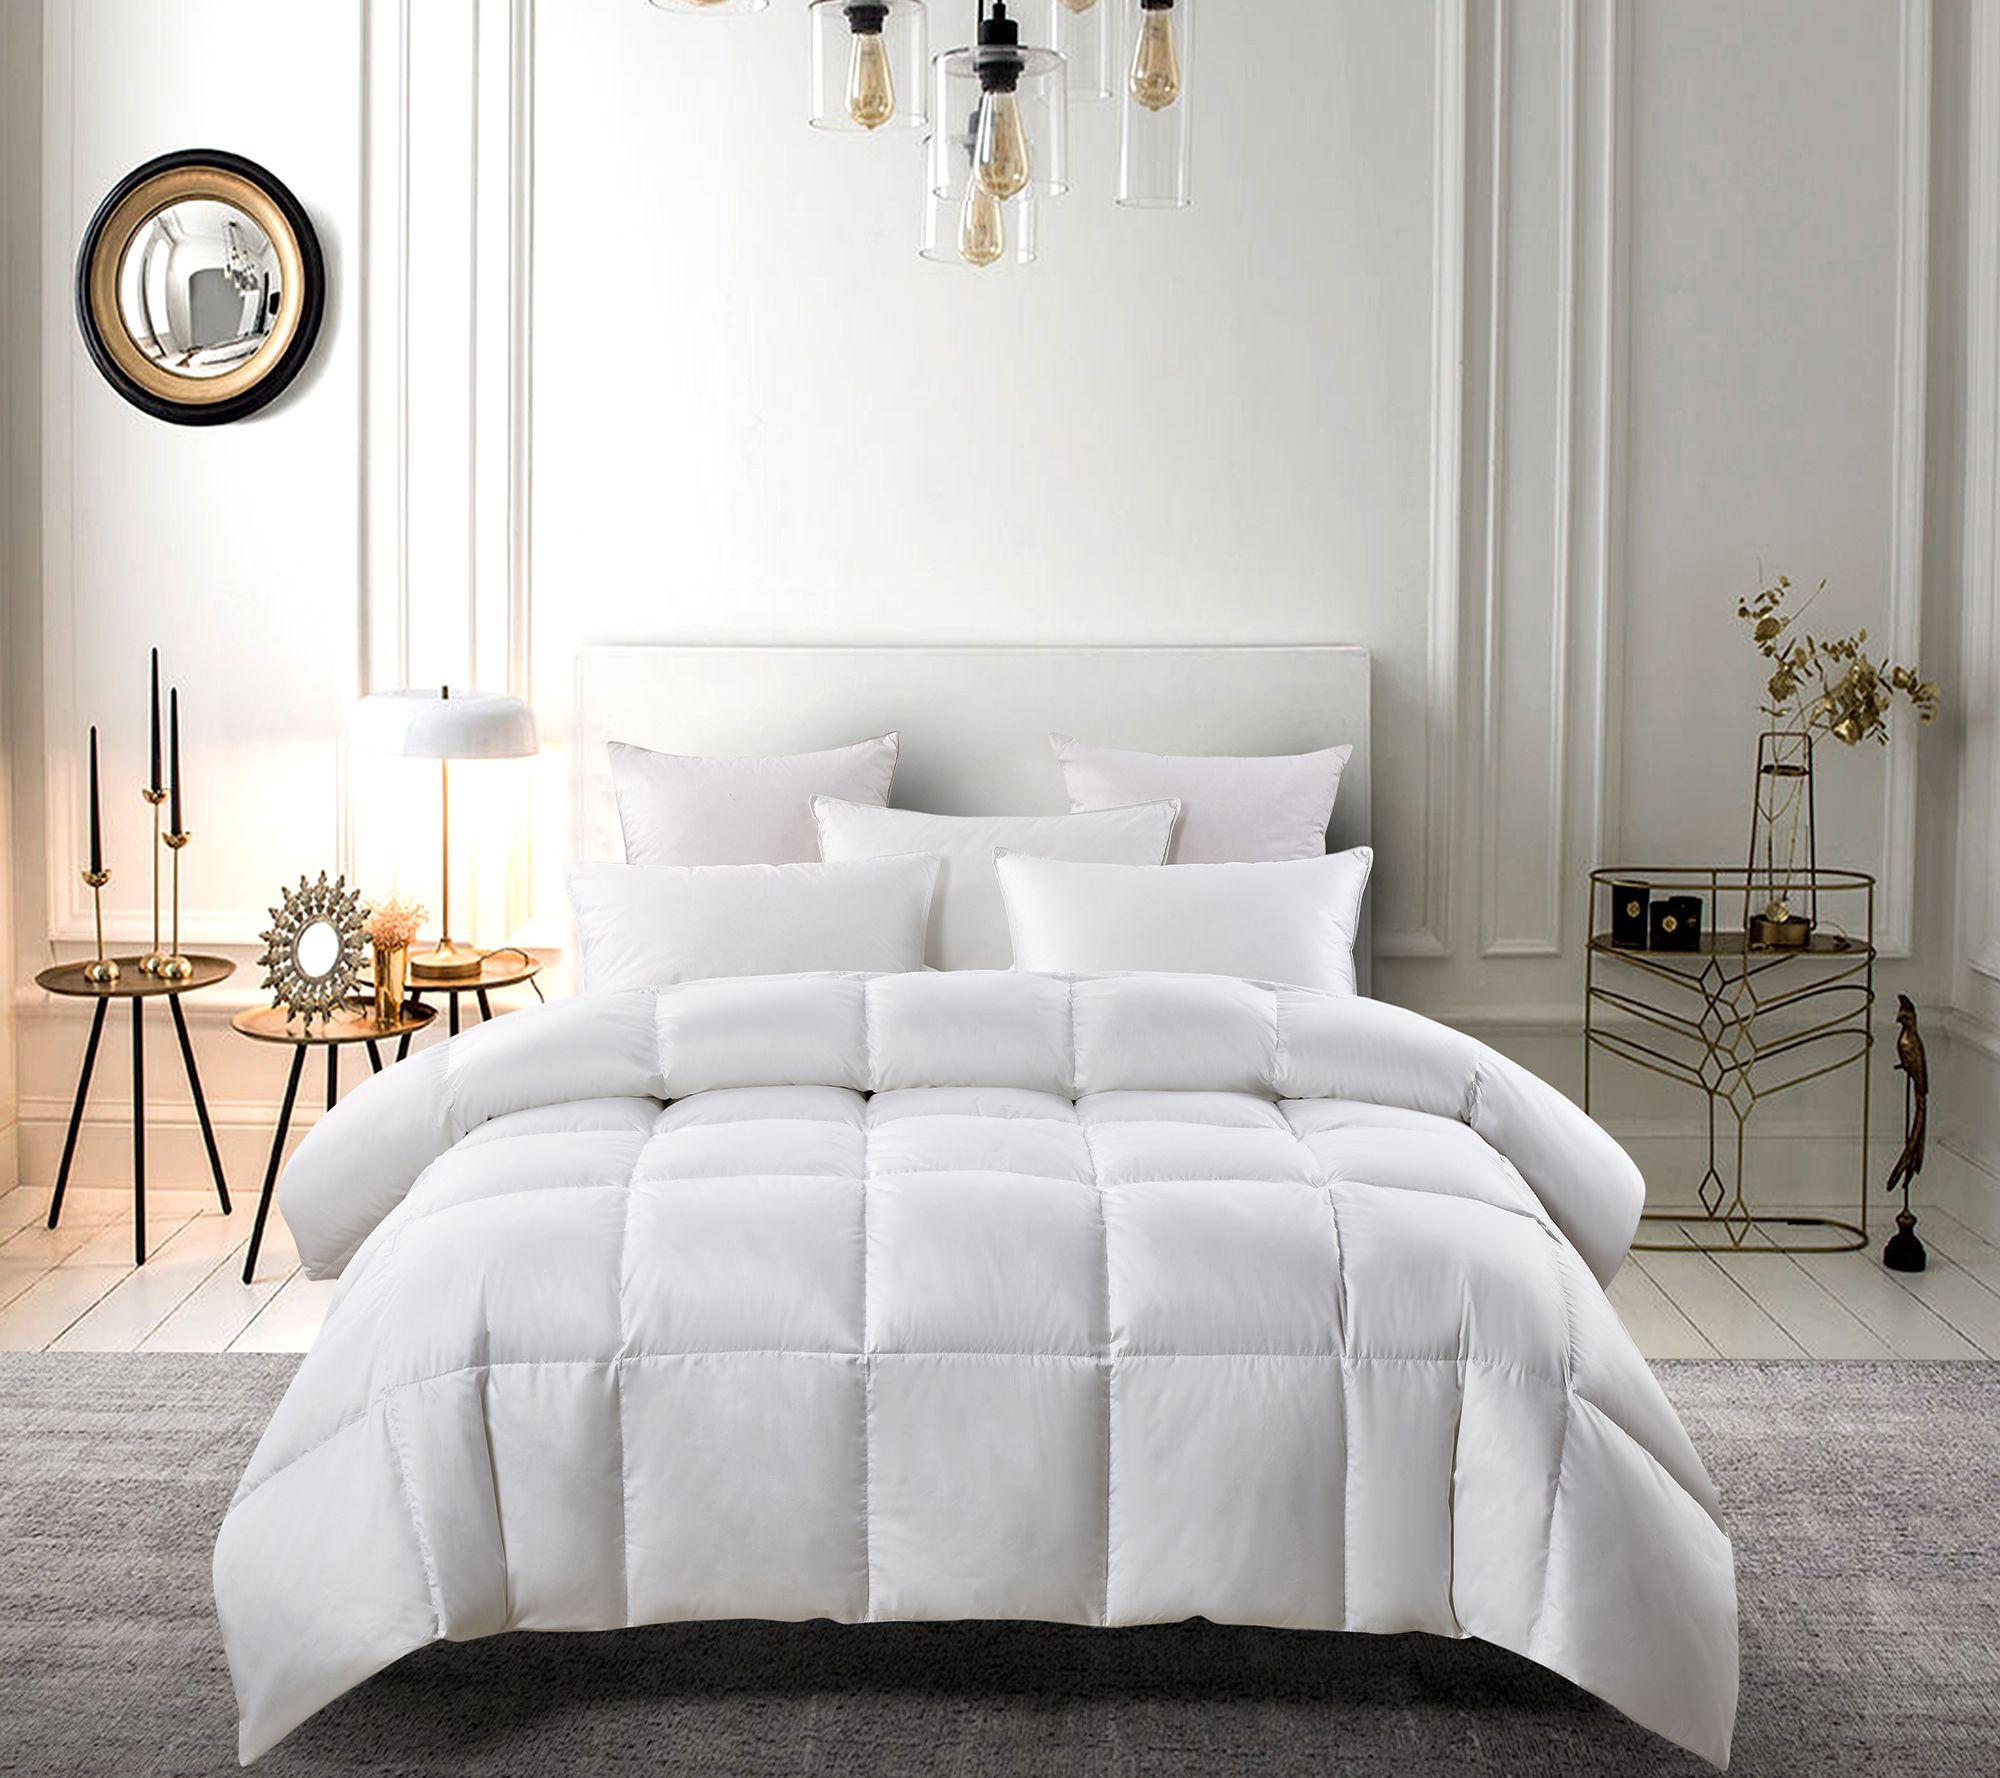 Serta Light Warm White Down Fiber Comforter F Q Qvc Com